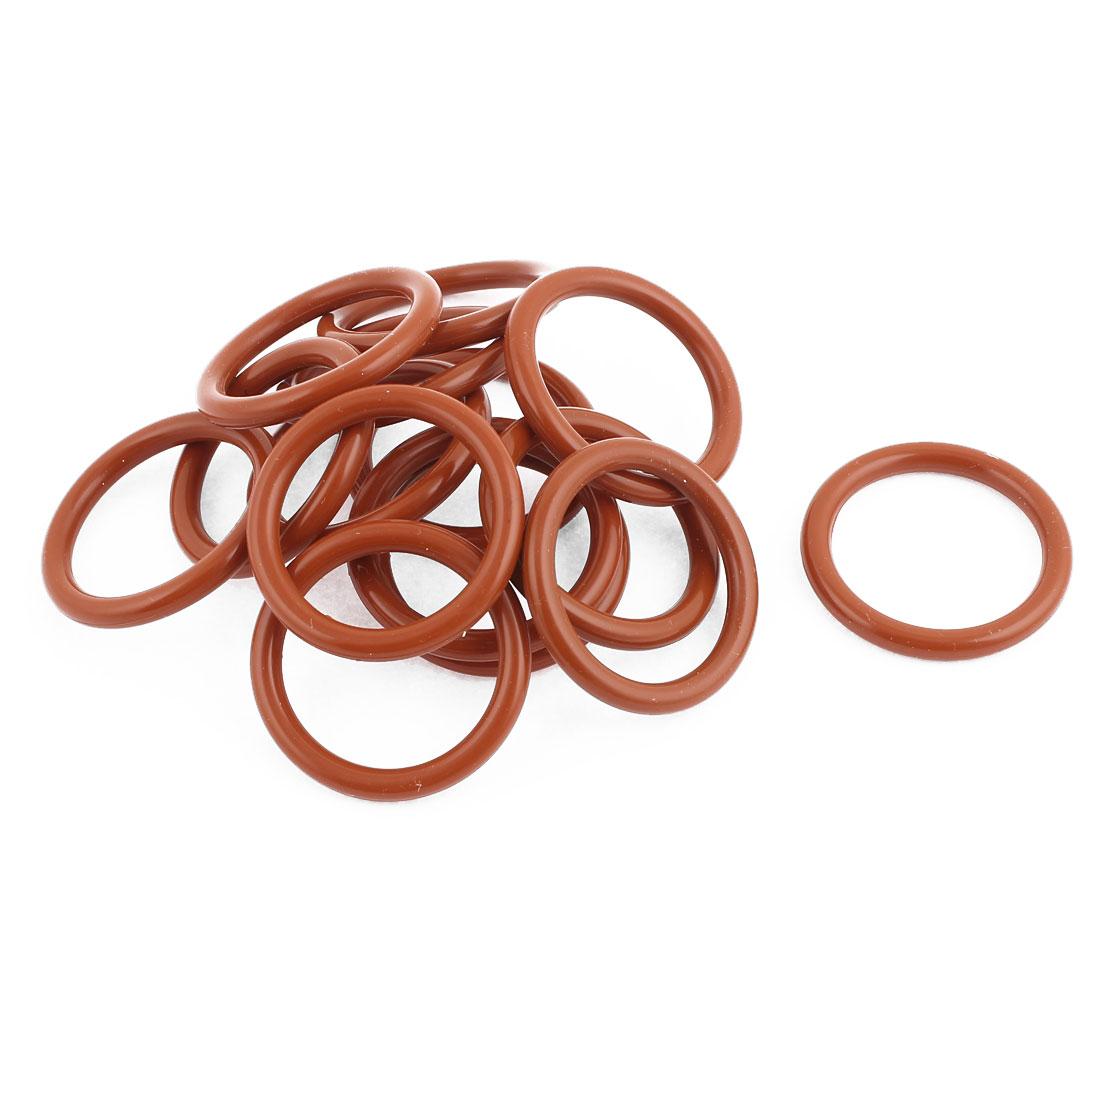 35mm OD x 27mm ID x 4mm H Sealing Ring Black Rubber O Type 15 Pcs